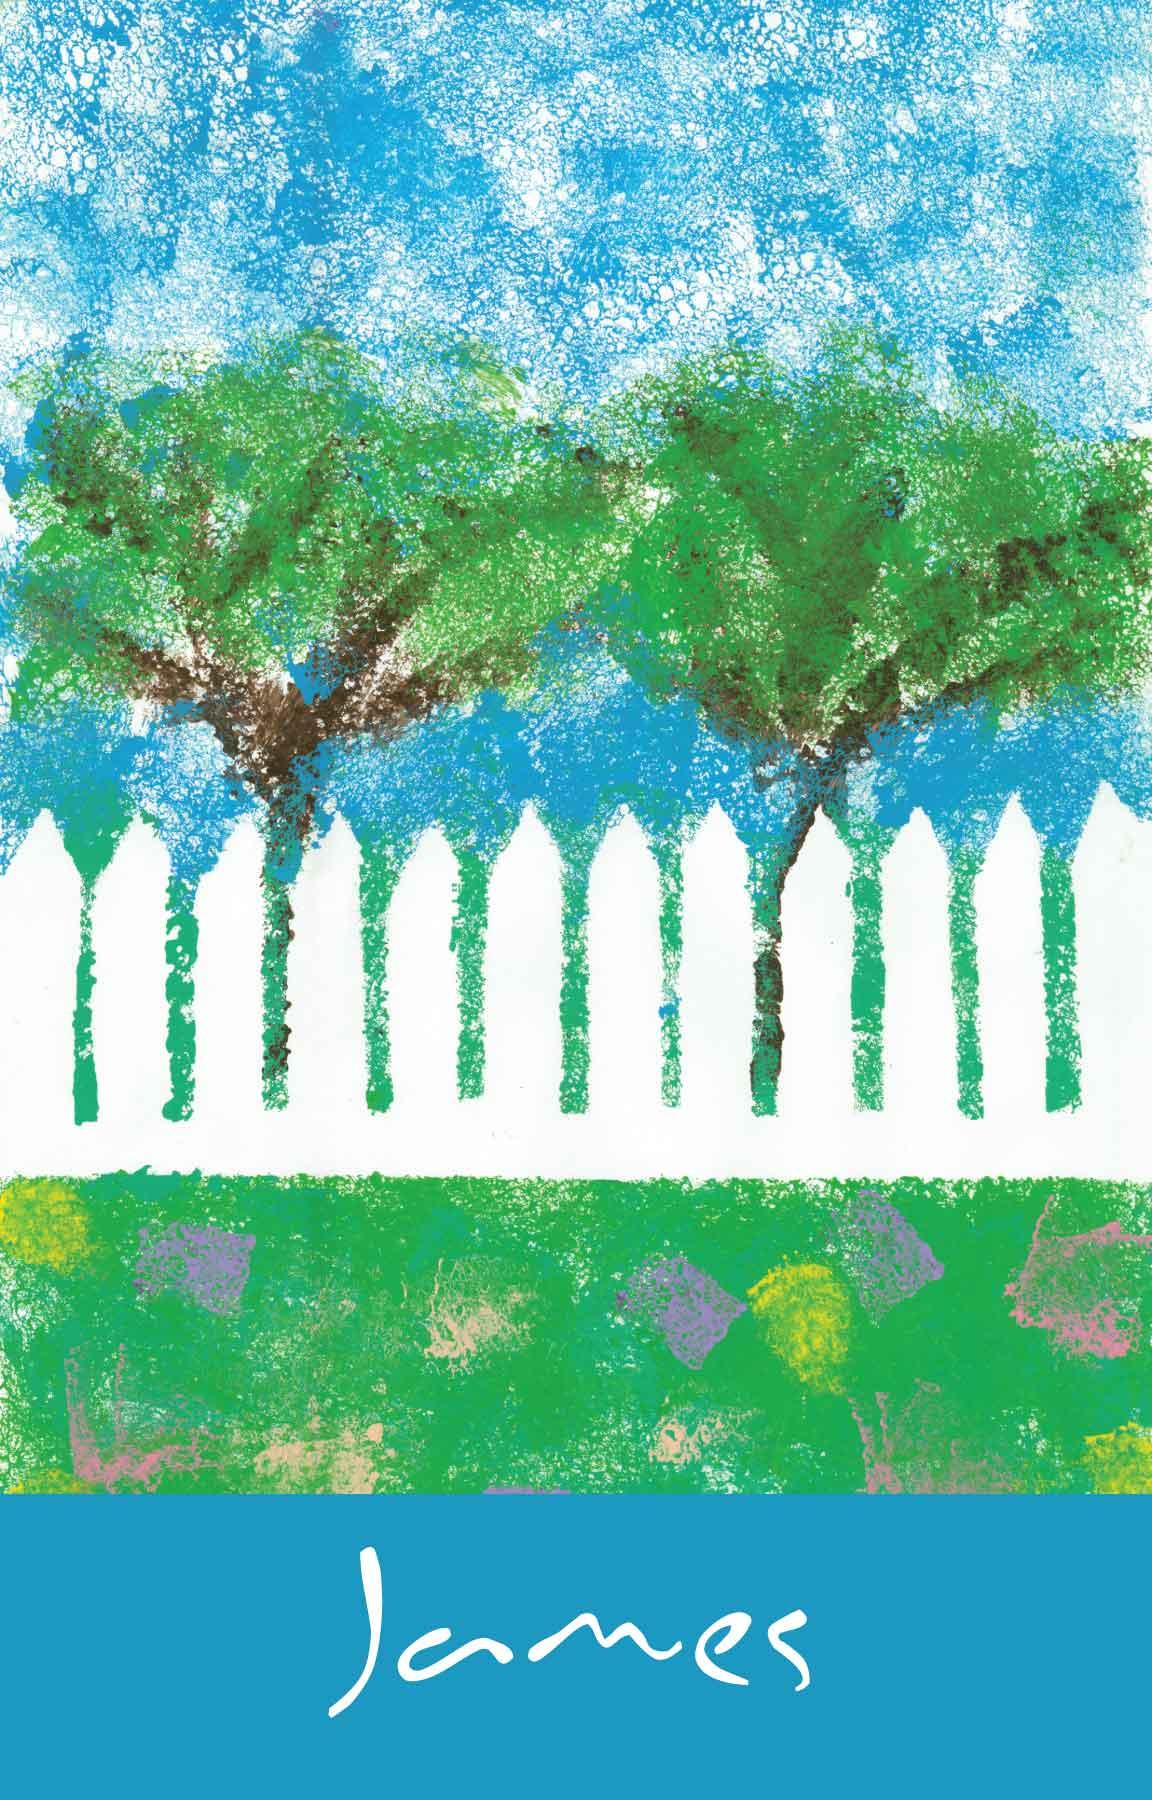 James-Garden-ILMKA